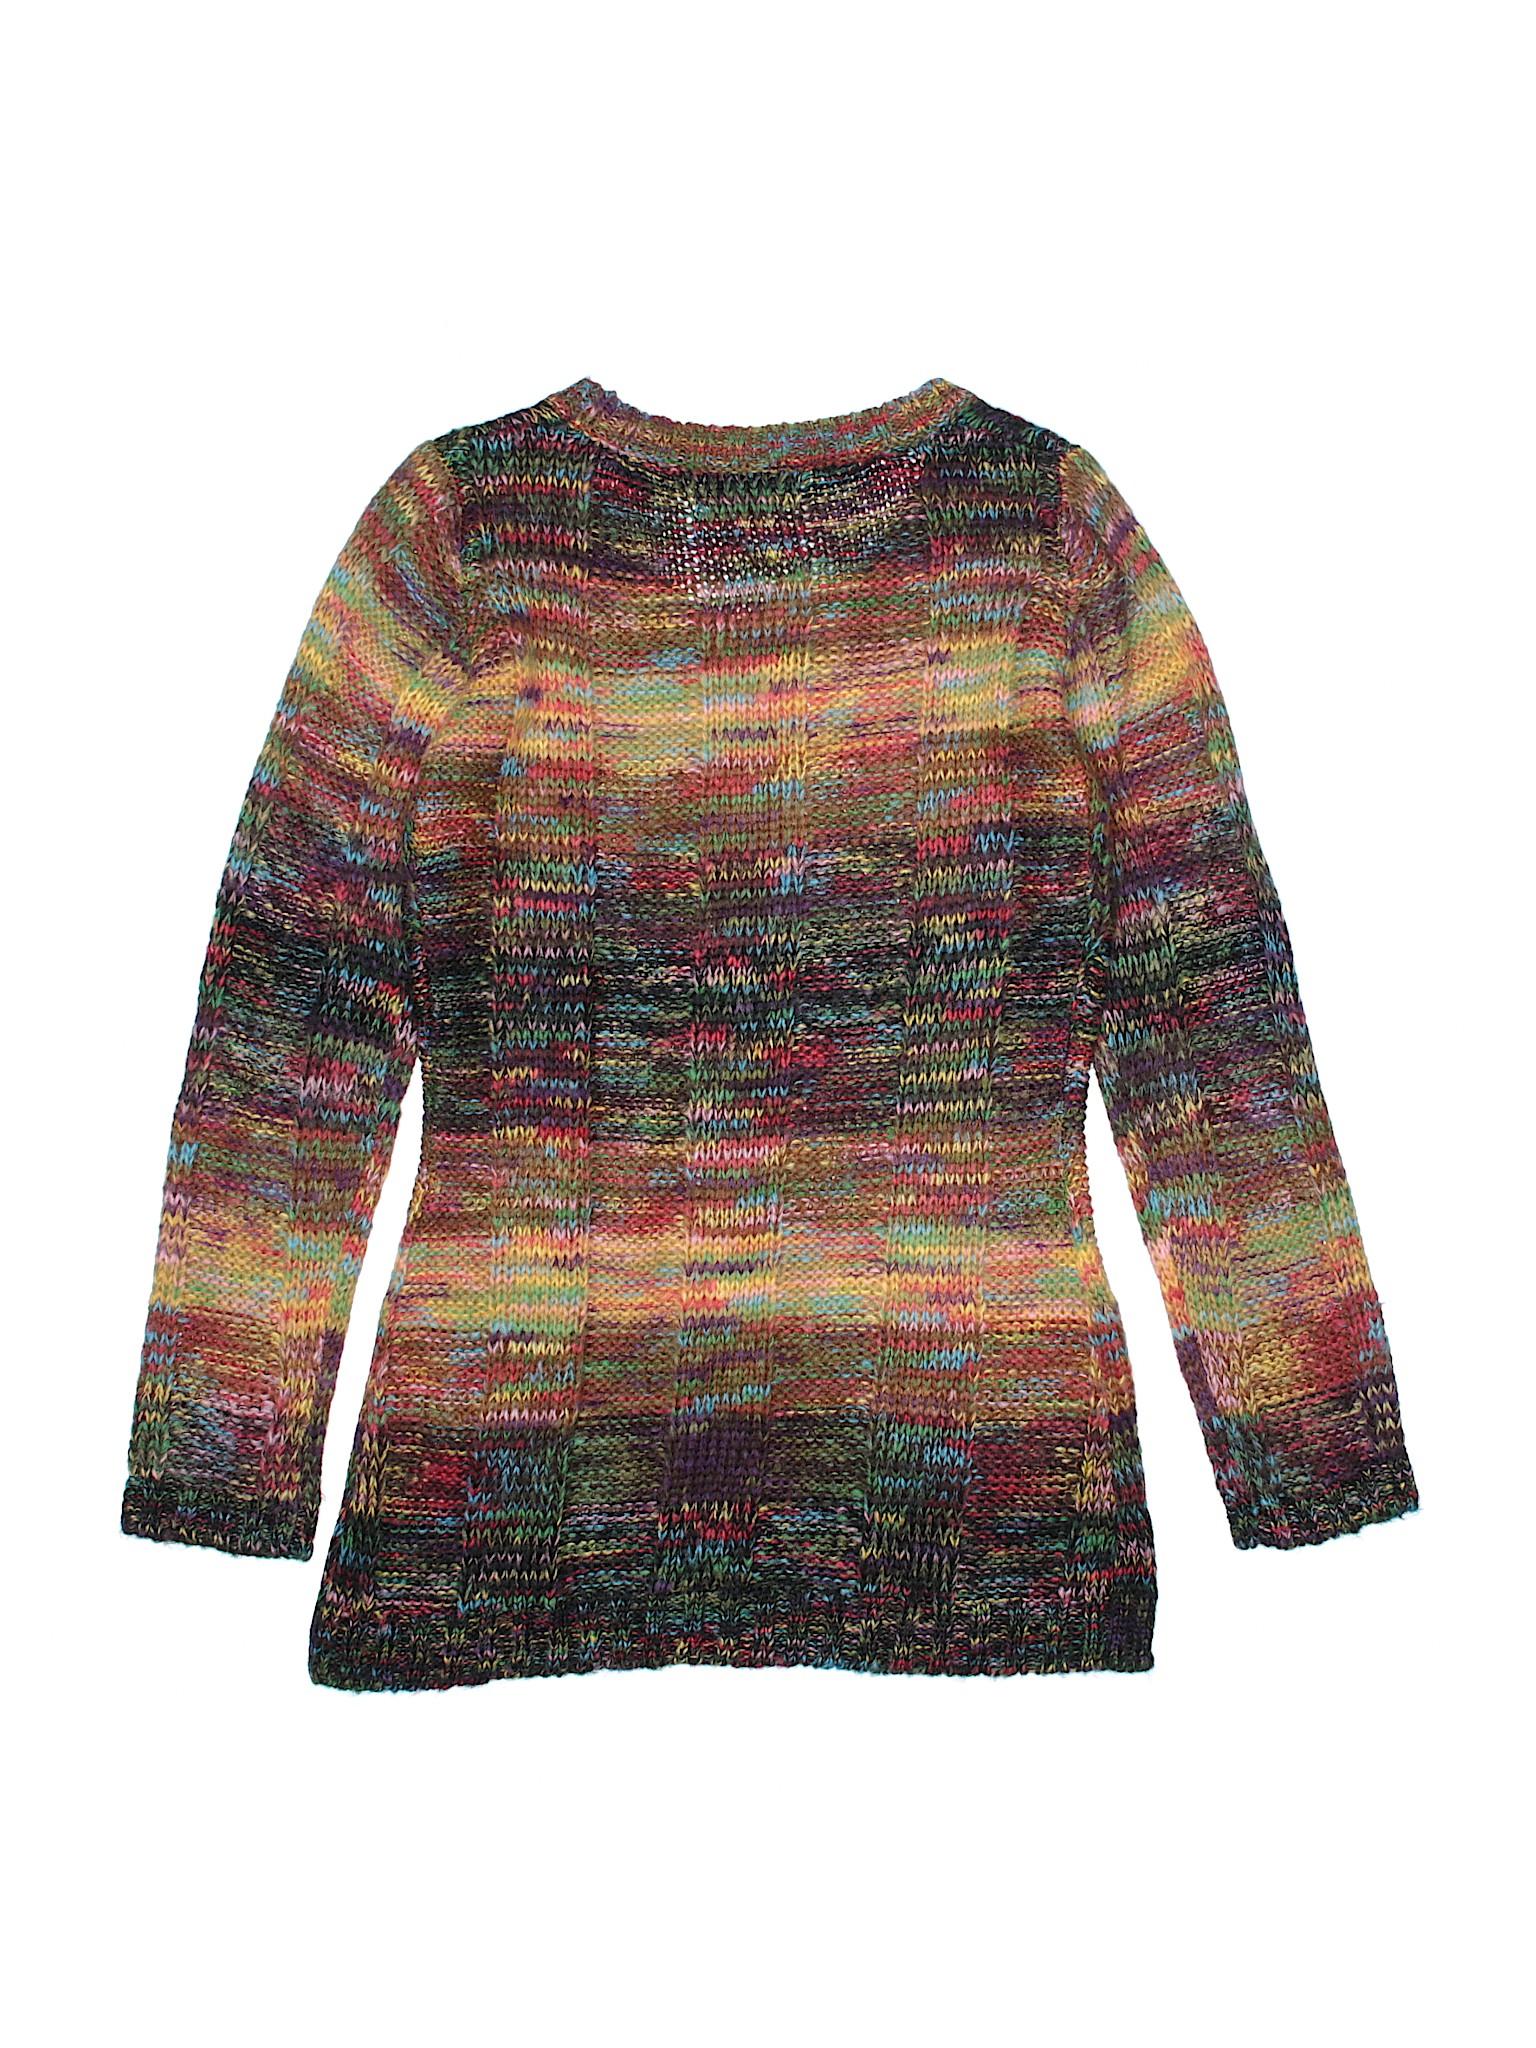 Sweater Boutique Bobbie Pullover Brooks Pullover Bobbie Boutique Pullover Brooks Boutique Bobbie Sweater Brooks IHUS7q